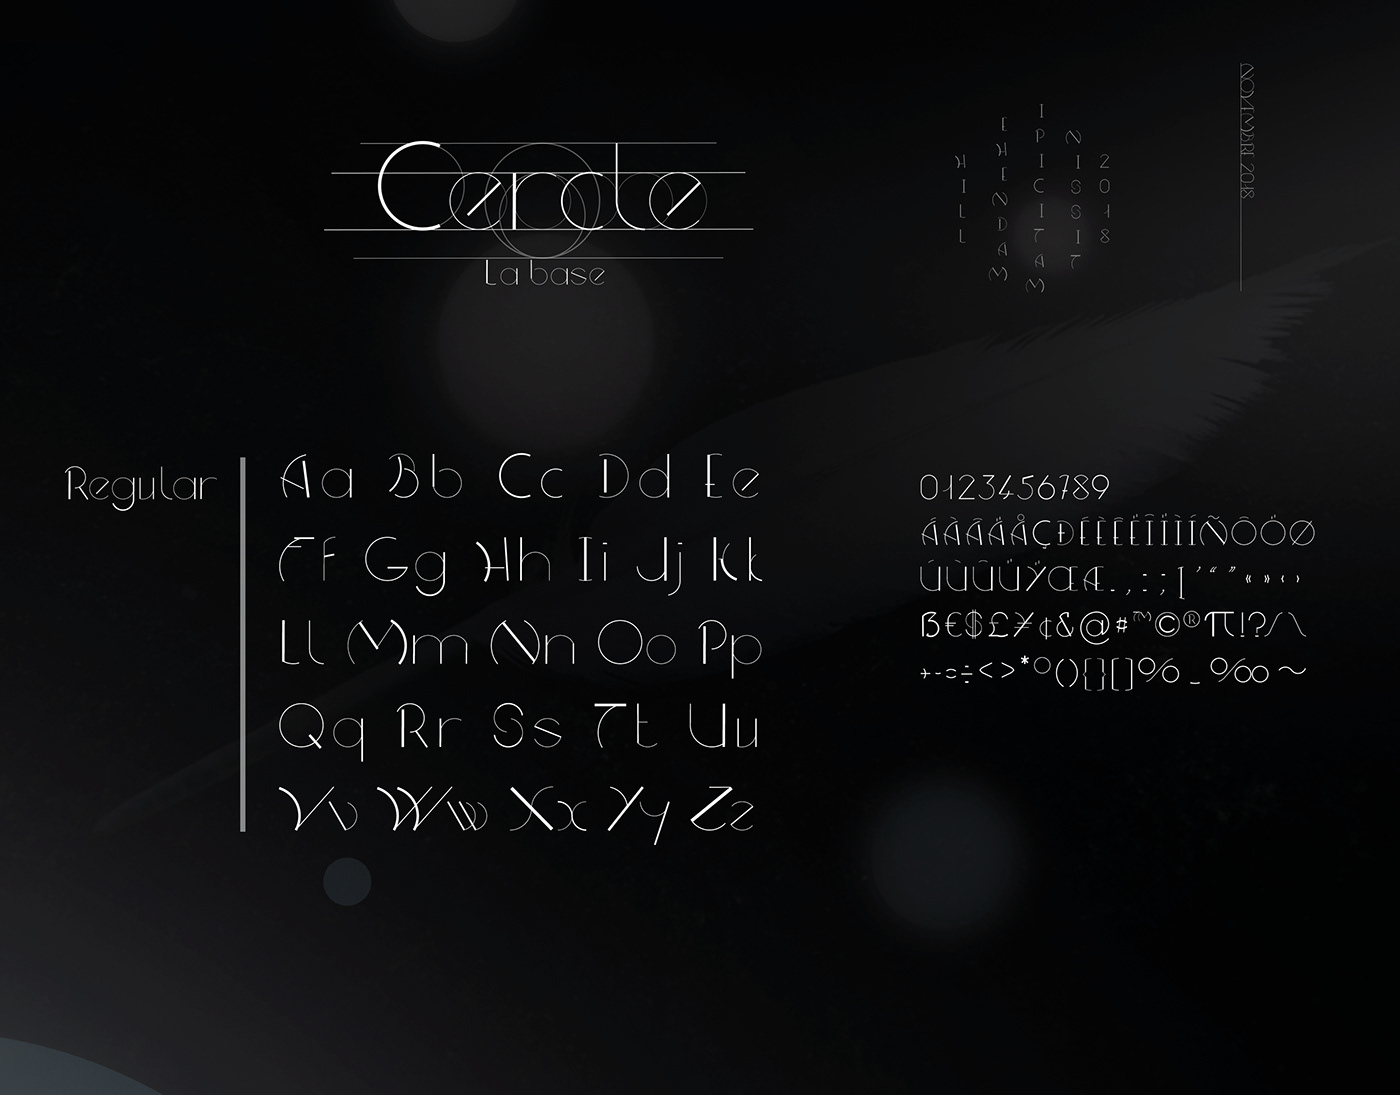 graphisme Typographie evolutive fantaisiste lettrine cercle typo